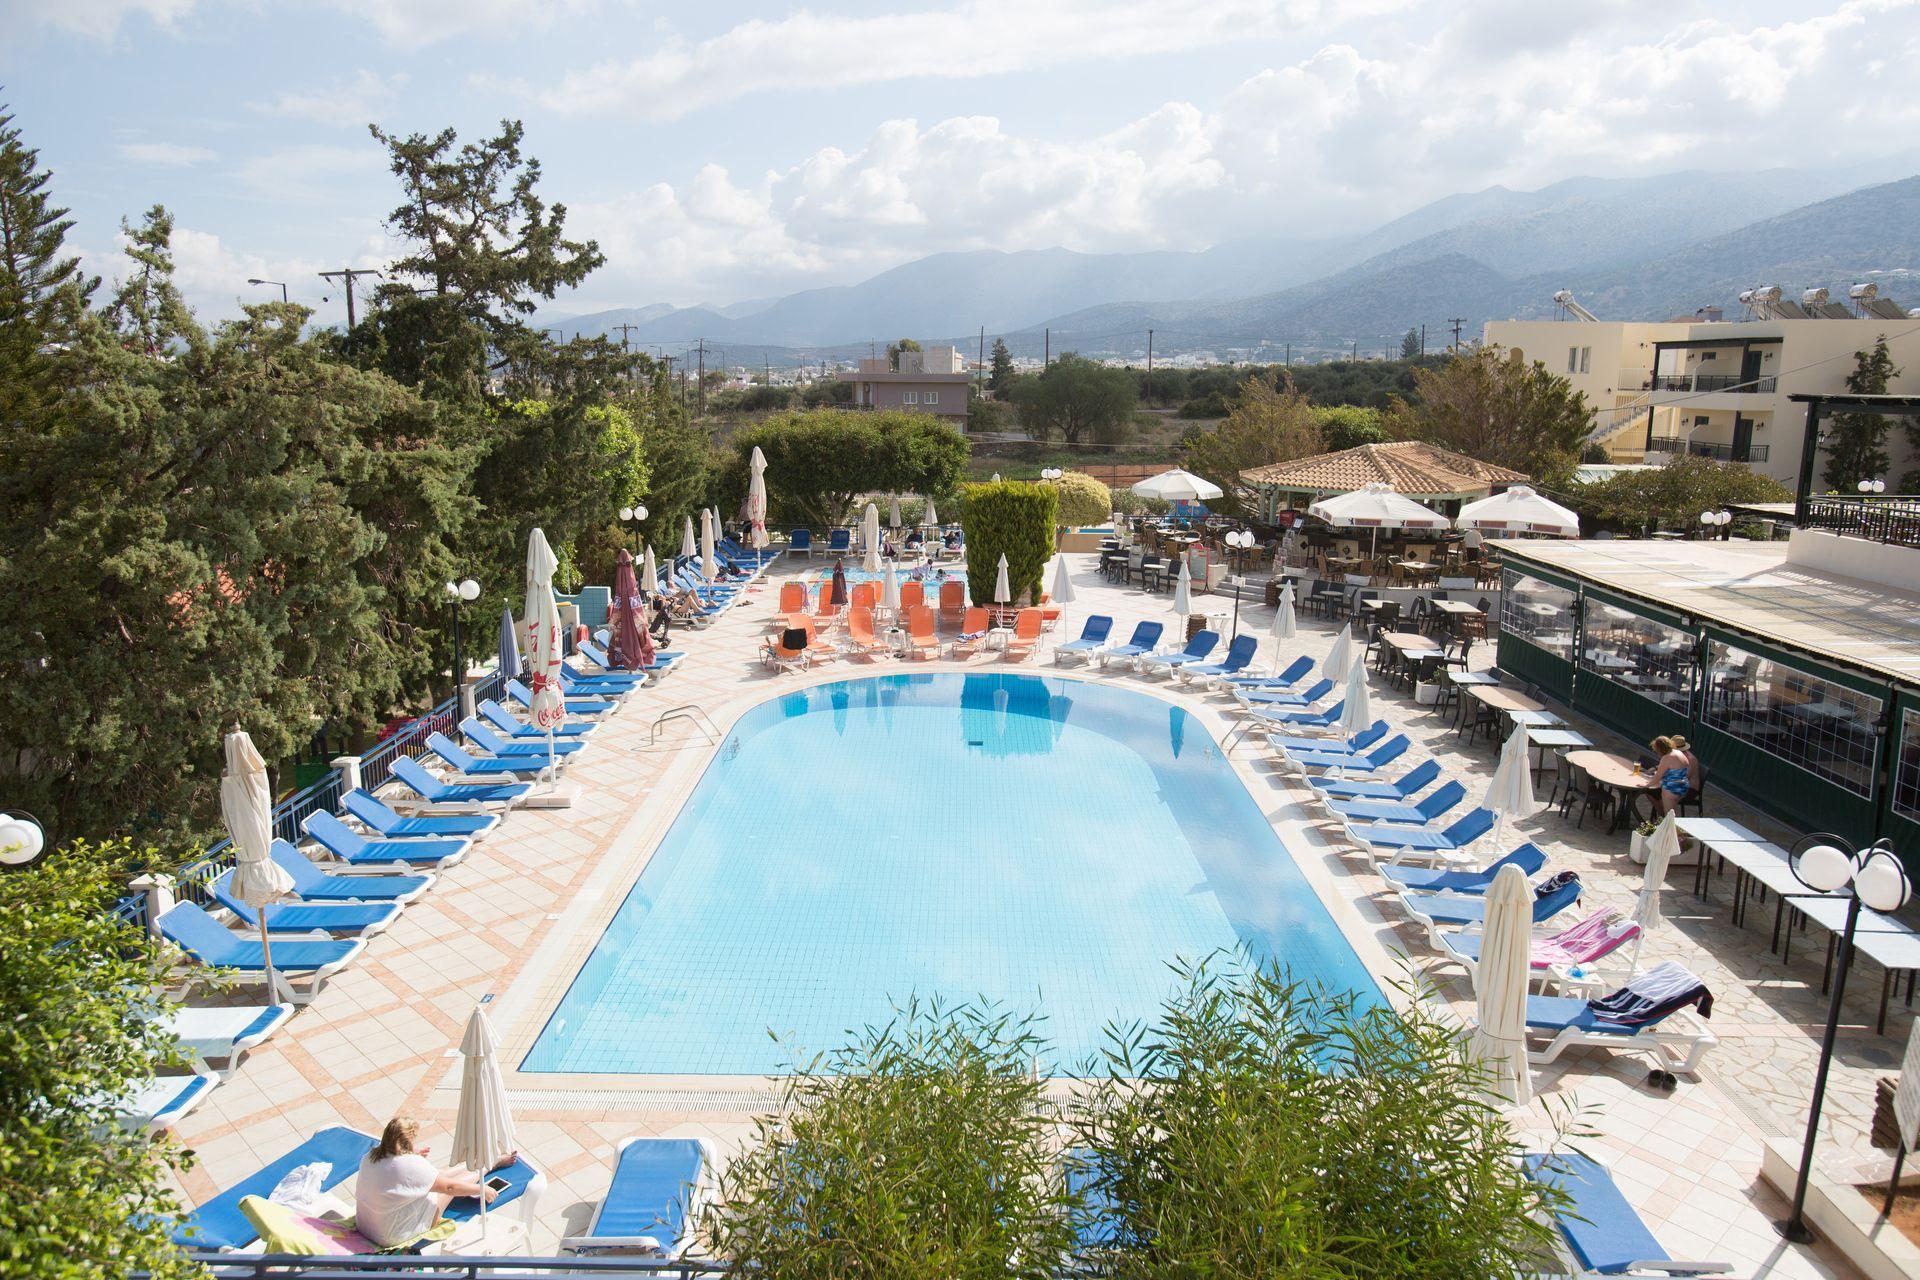 Anastasia Hotel Crete - Σταλίδα, Κρήτη ✦ 2 Ημέρες (1